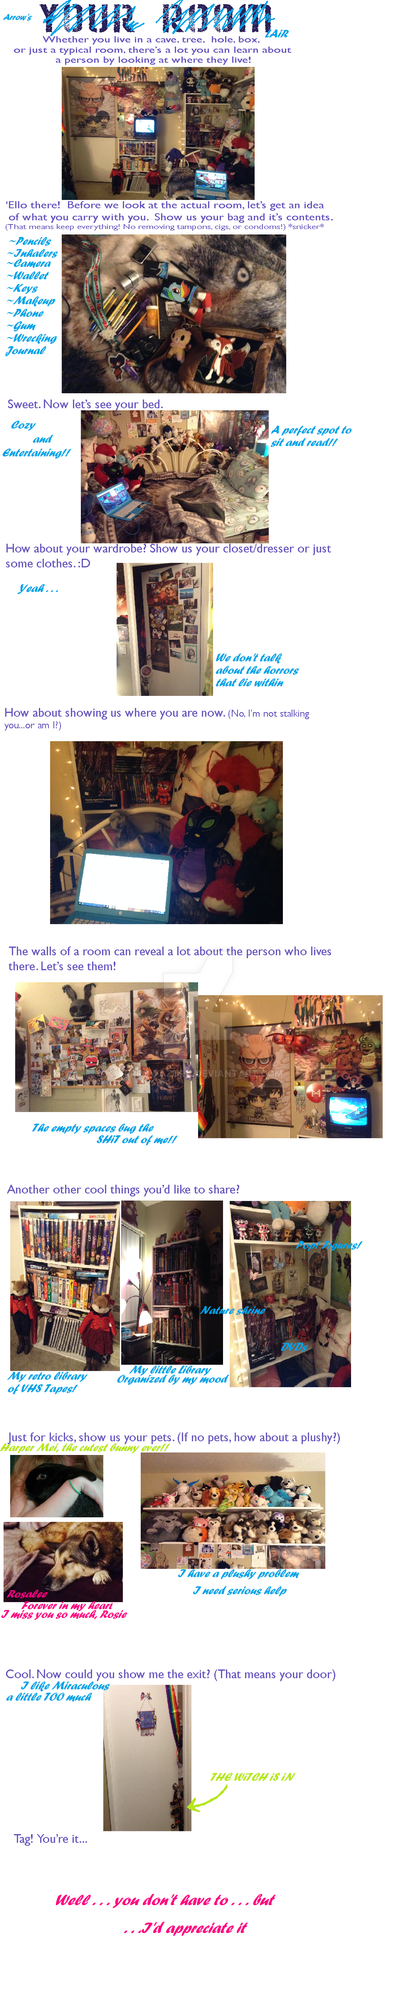 Rosalee S Room